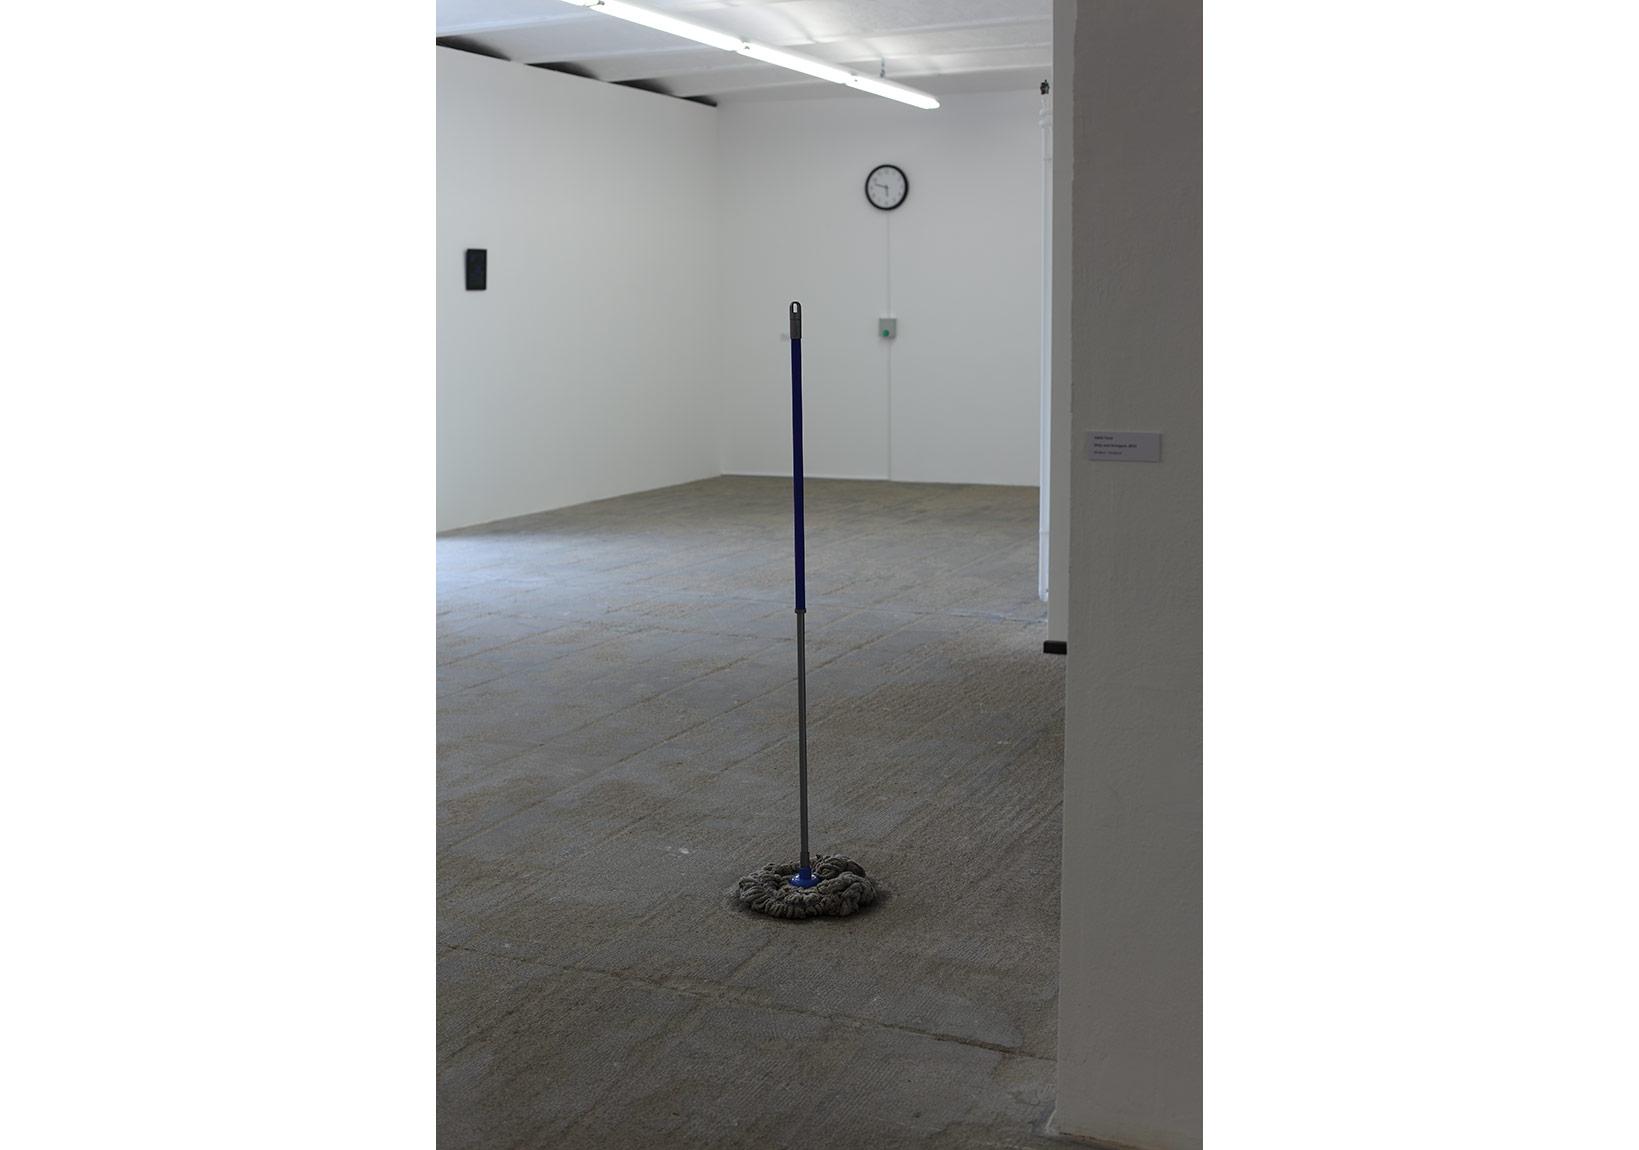 Kirli ve kibirli, Heykel, 2012Dirty and Arrogant, Sculpture, 2012+++Vileda sweeperÖzel Koleksiyon, Private CollectionFotoğraf, Photo: Vahit Tuna